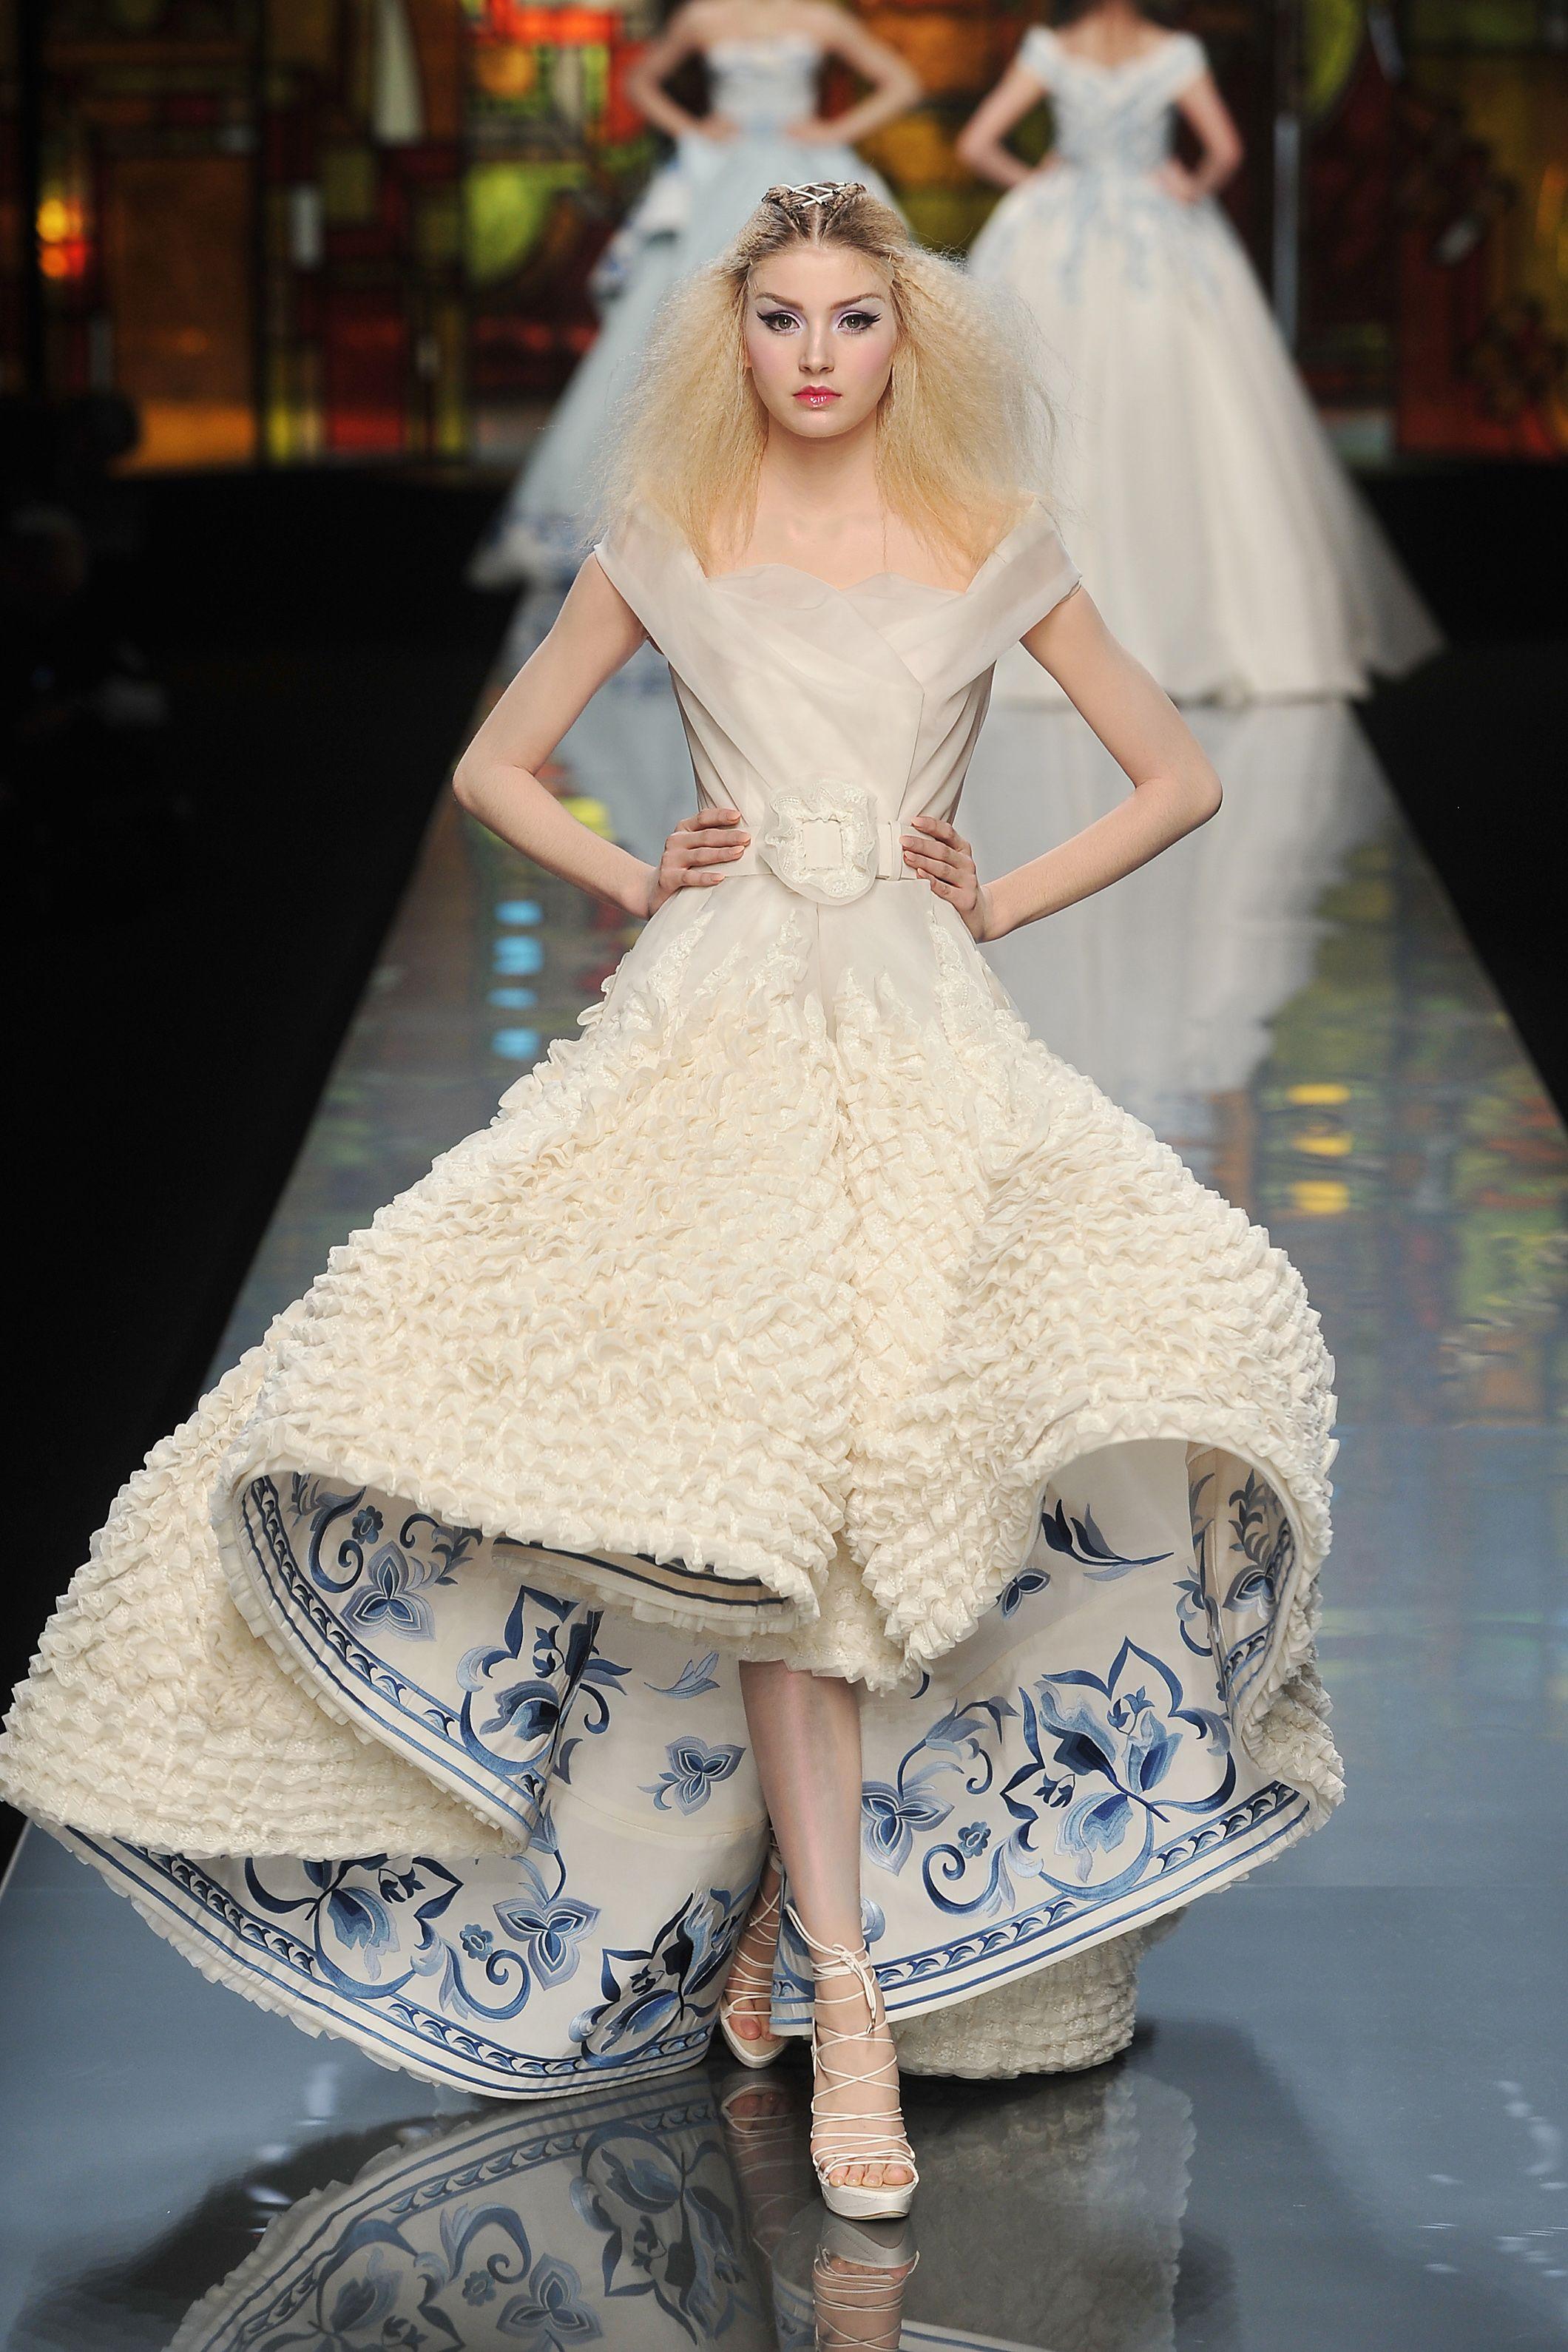 Christian Dior Wedding Dress Collection 2 | Wedding Dresses ...